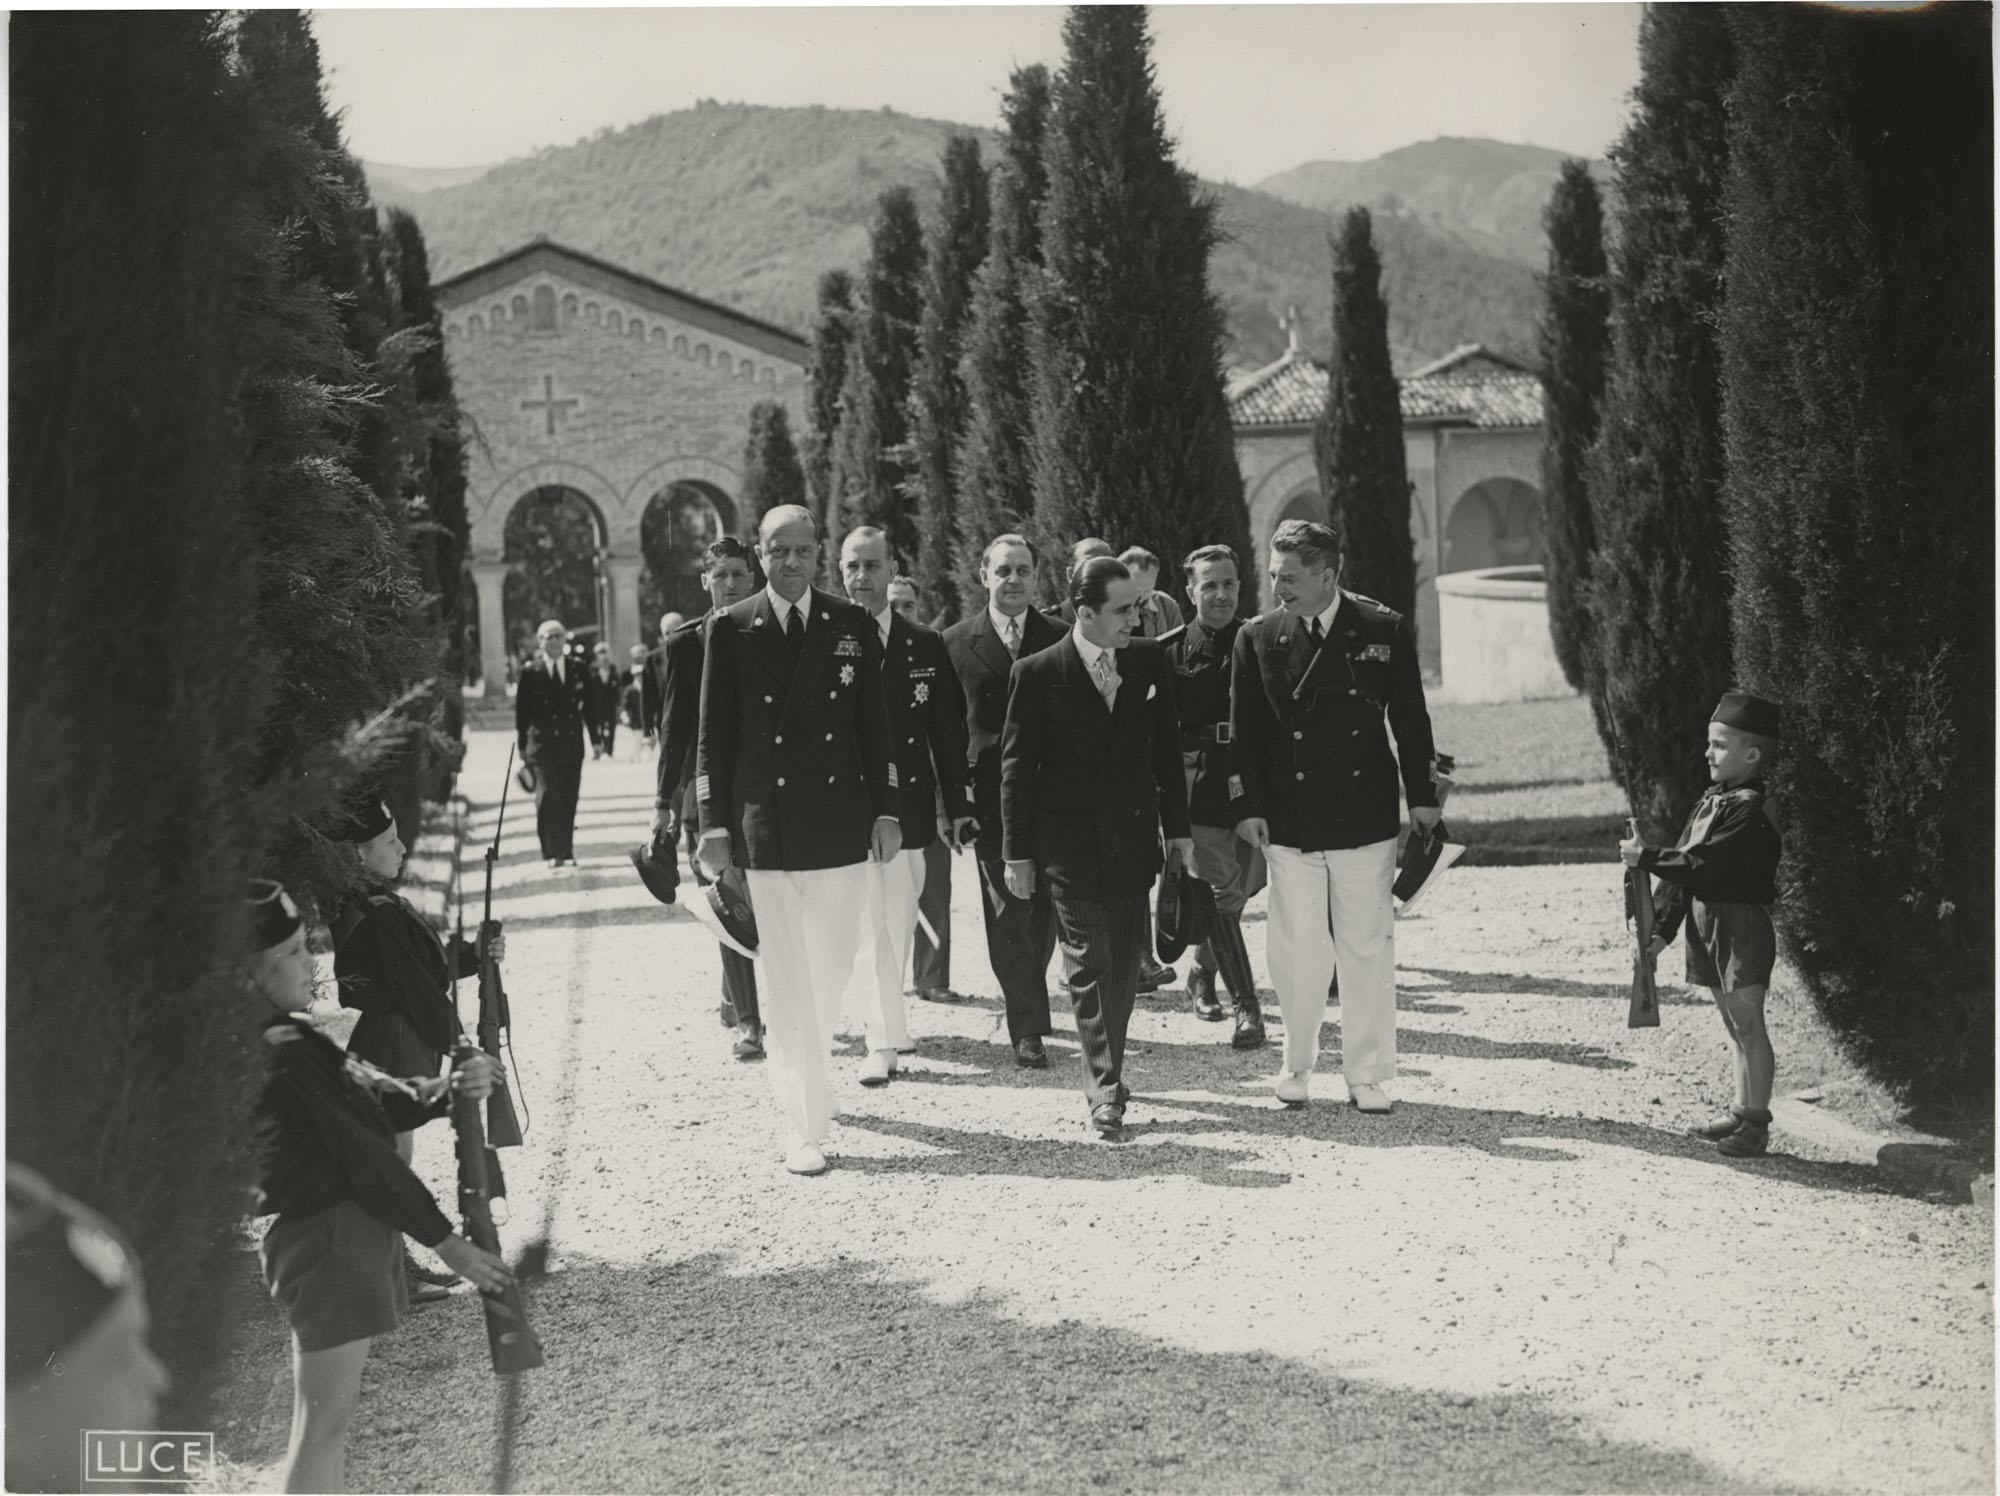 Mihai Antonescu's visit to Benito Mussolini, Photograph 62